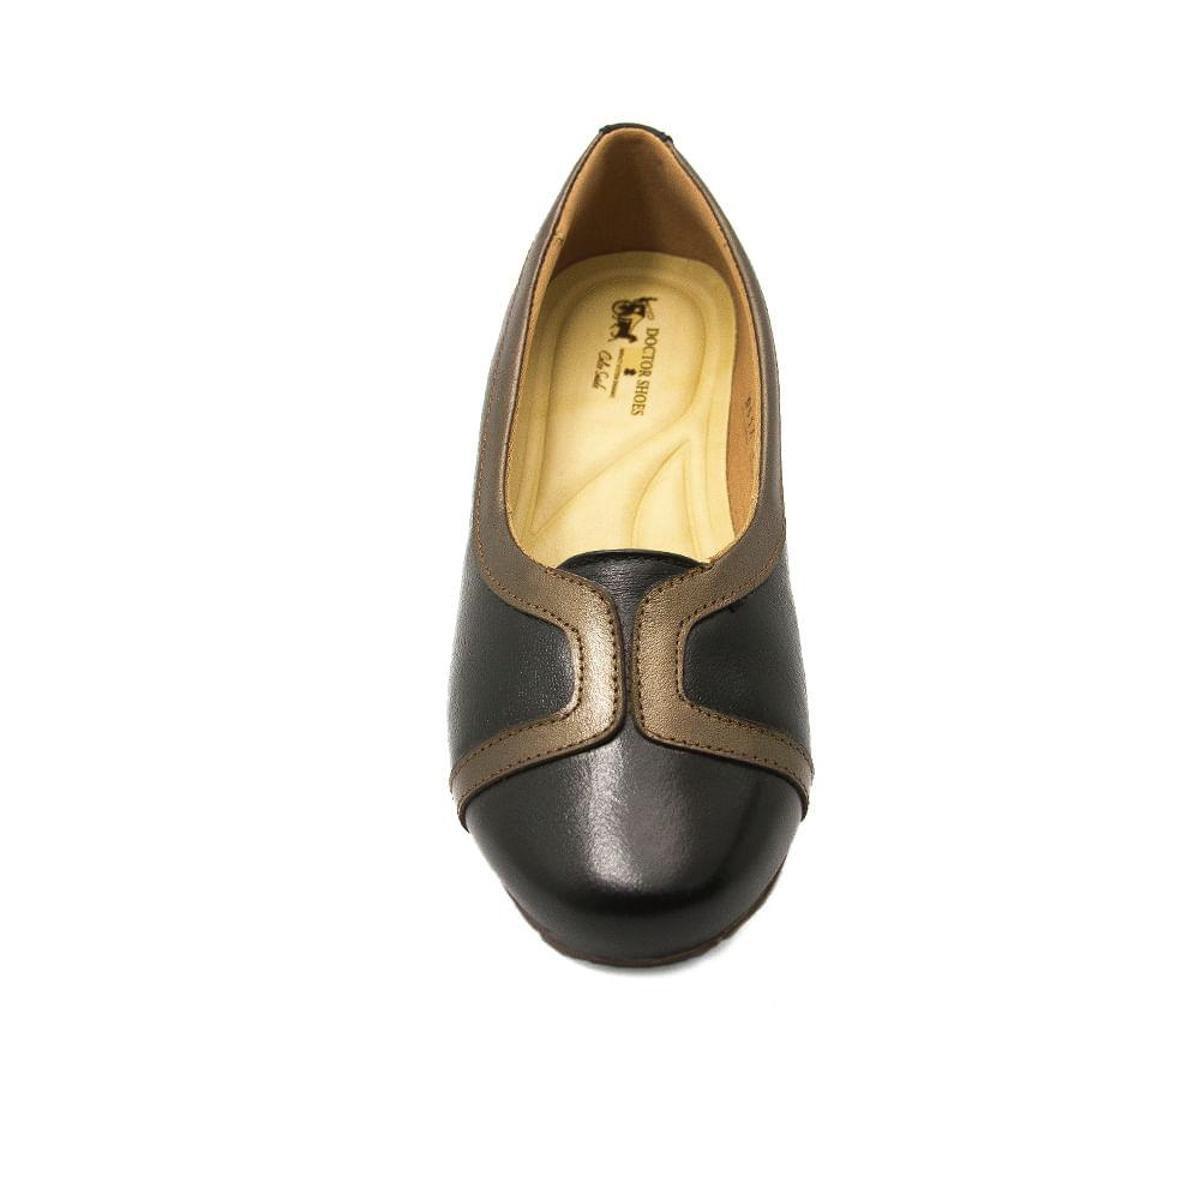 Shoes Couro Doctor Sapatilha Sapatilha Feminina Preto 1329 em Feminina qn4vwB4F